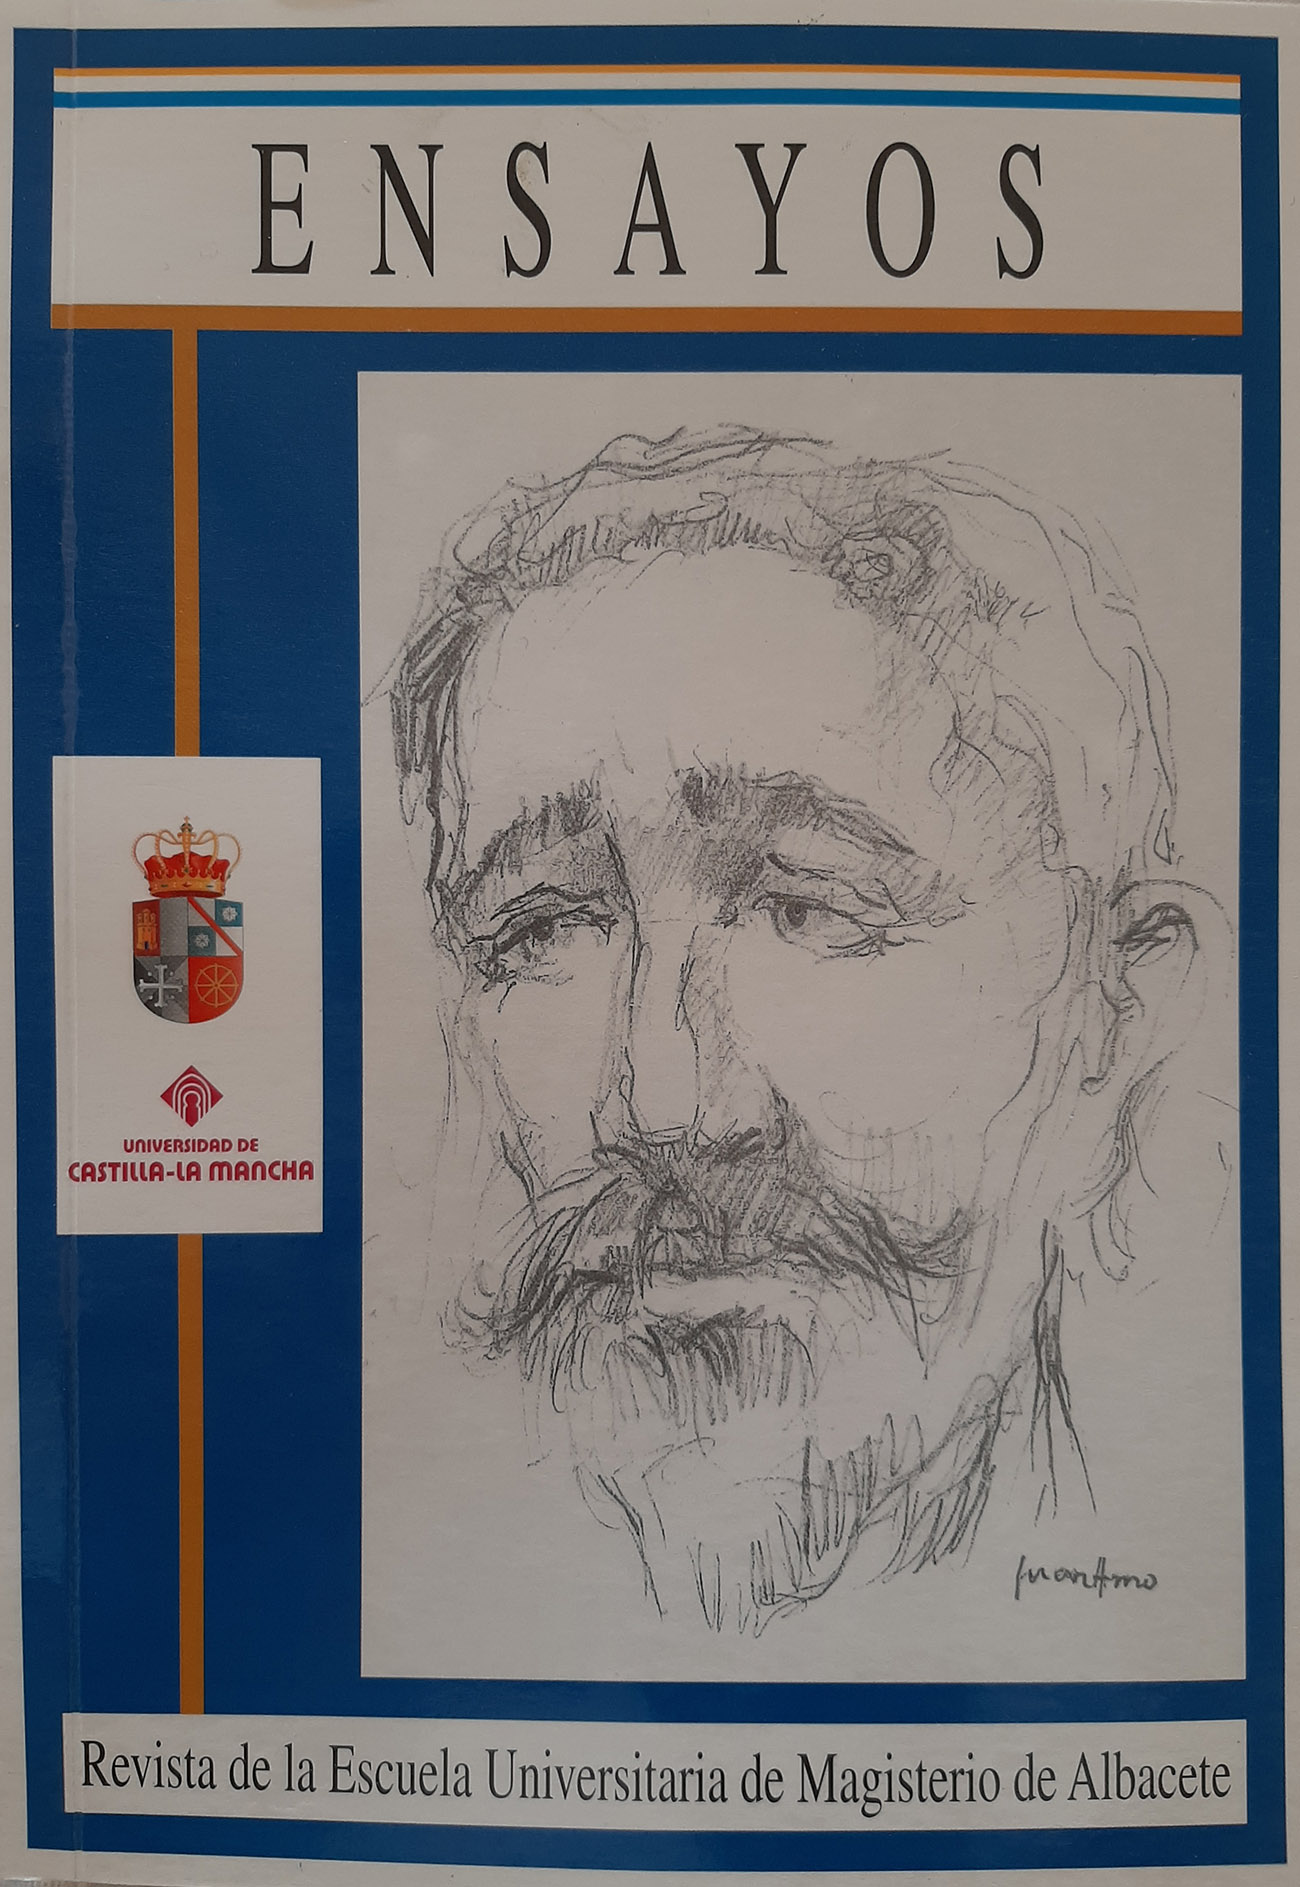 Juan Amo. (2003). Portada Revista Ensayos.